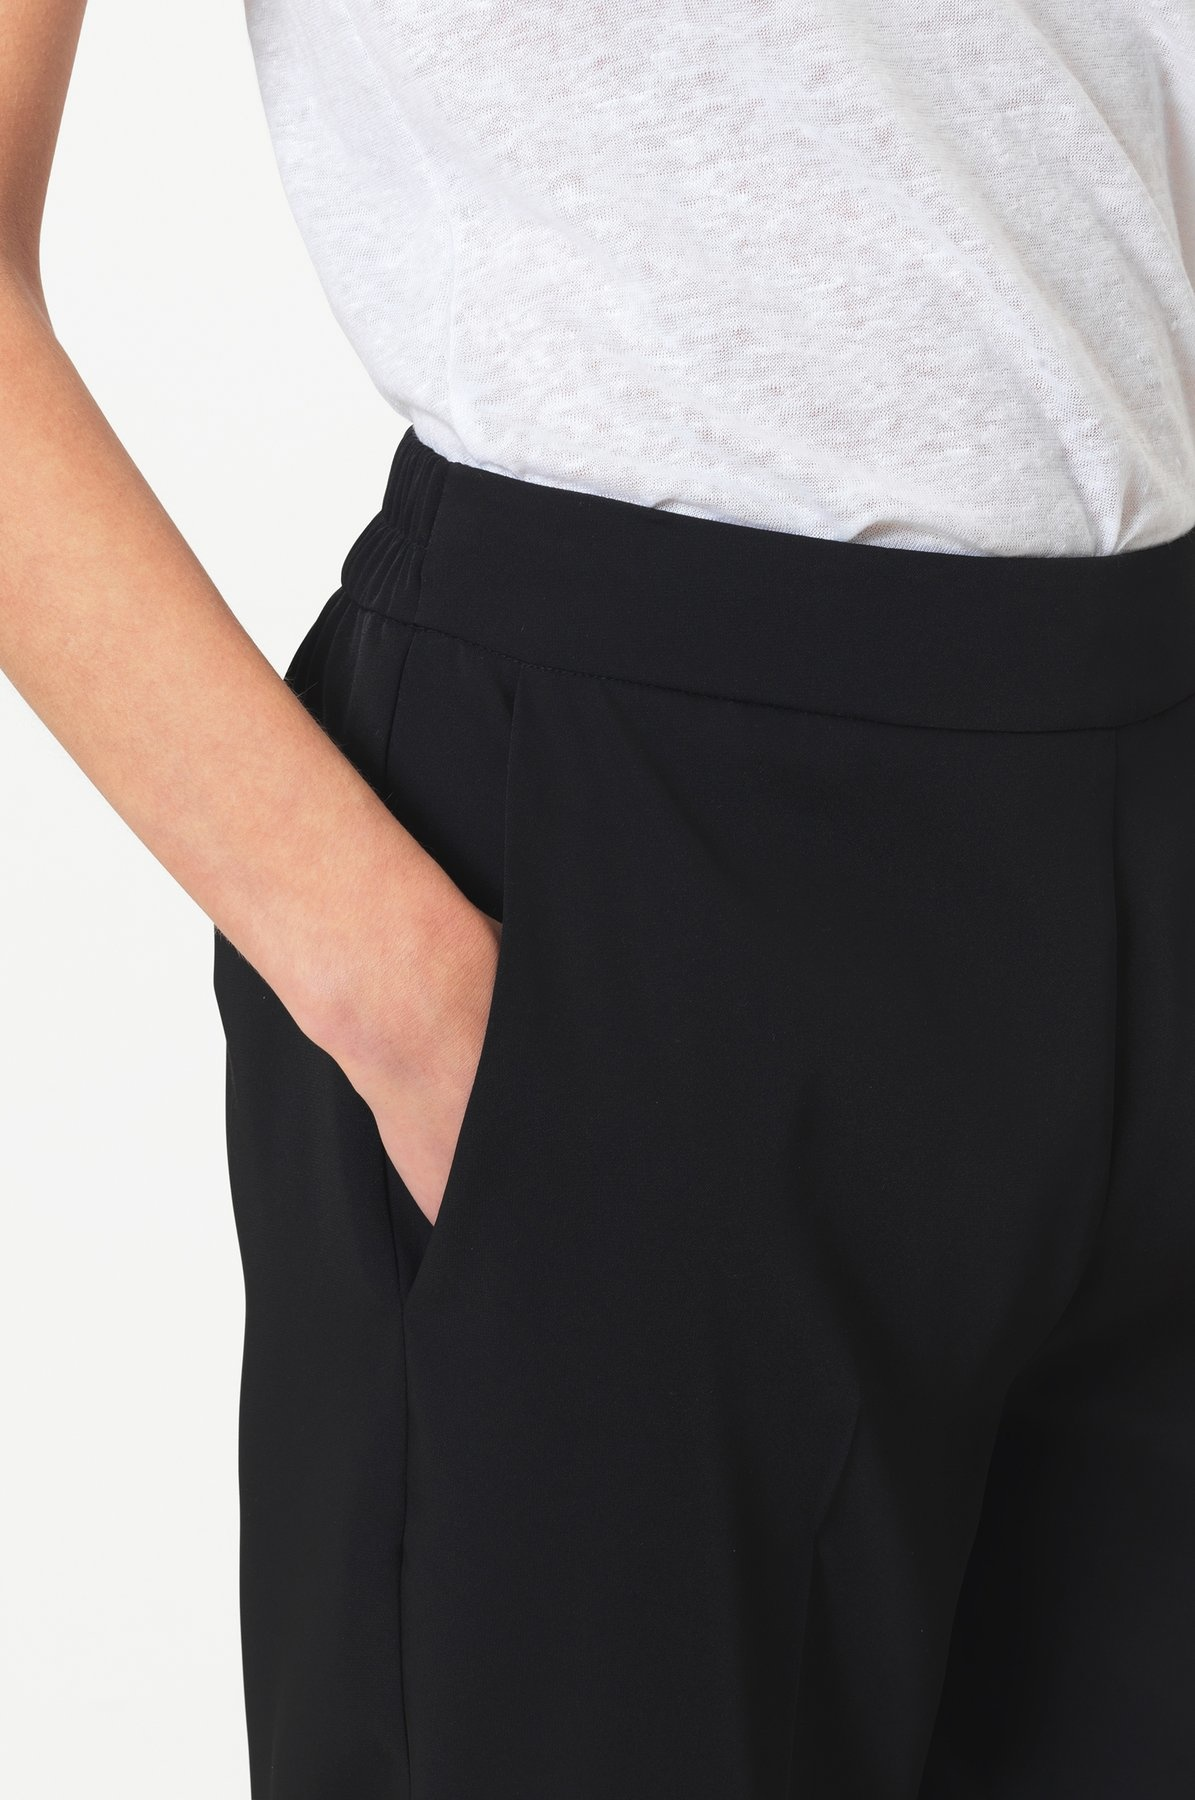 Garbo Trousers - Peppercorn-4